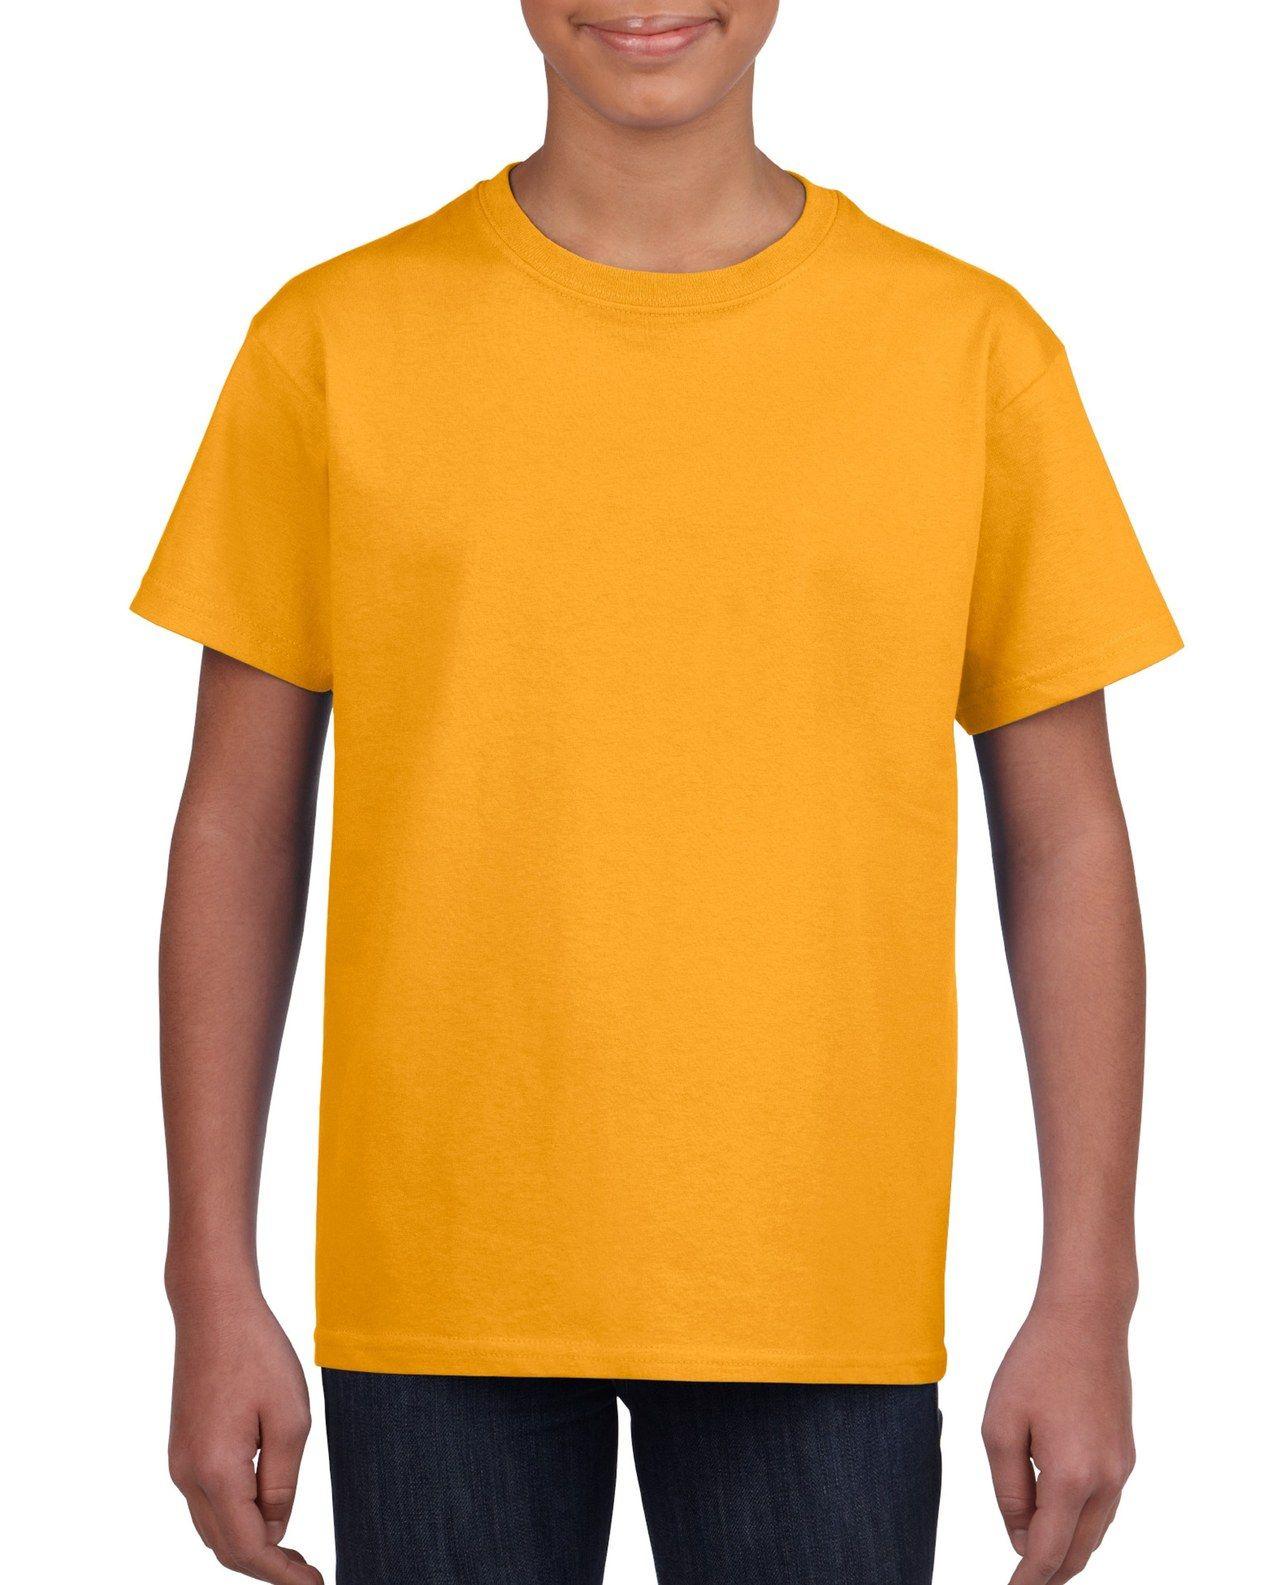 Custom Ultra Cotton Youth T Shirt Cheap Custom Shirts Print Shop